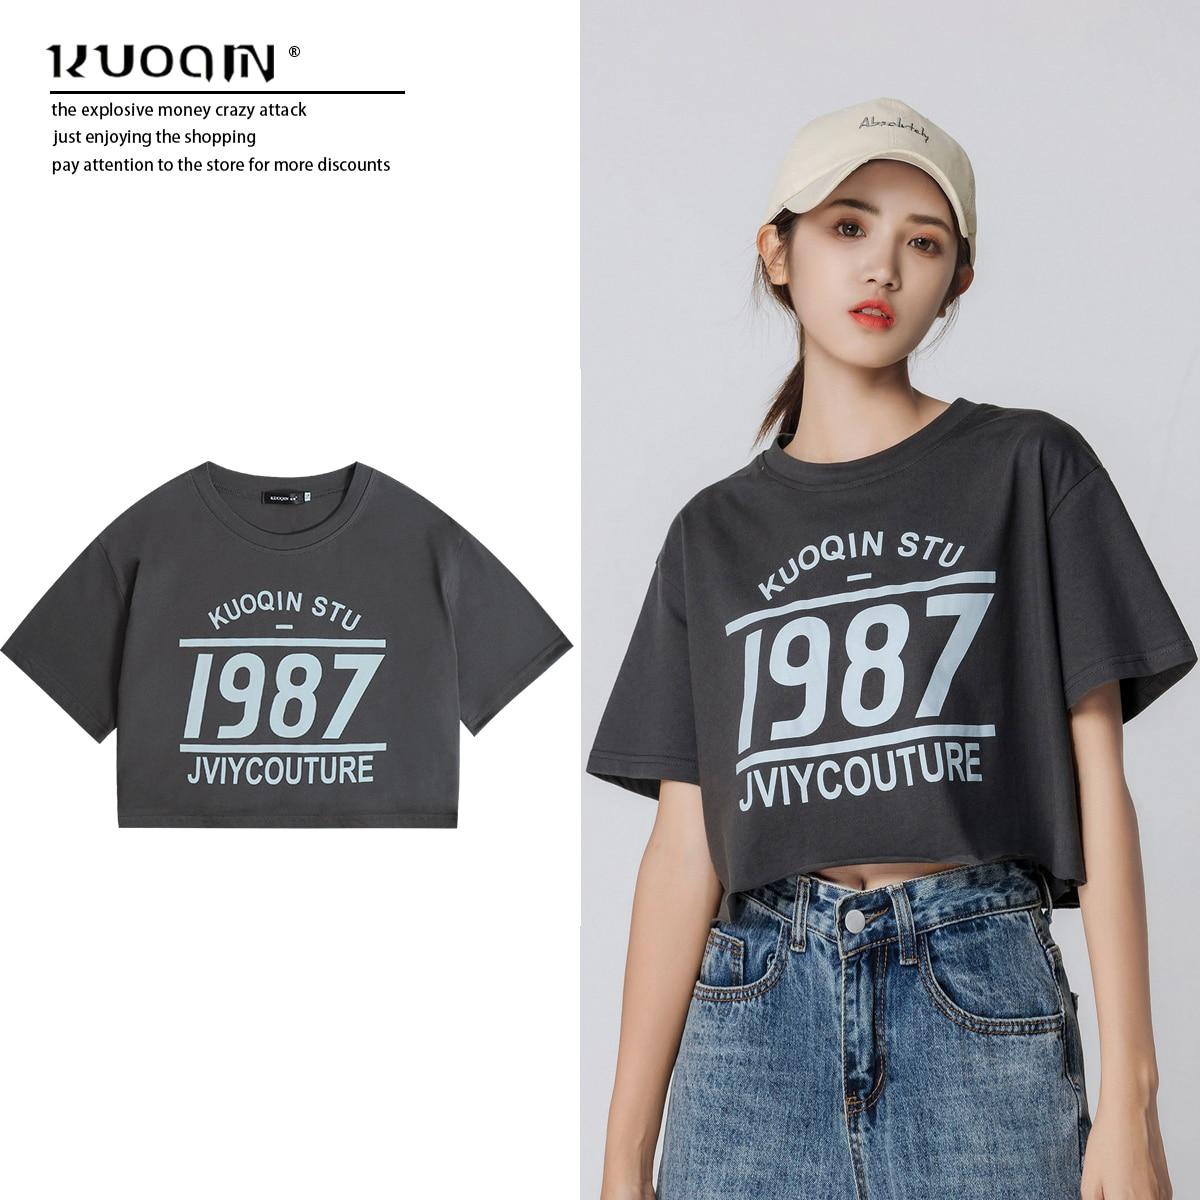 High Waist Pure Cotton Short-Sleeved T-shirt Women's Ins Super Popular Chic Elegant Short Top with W